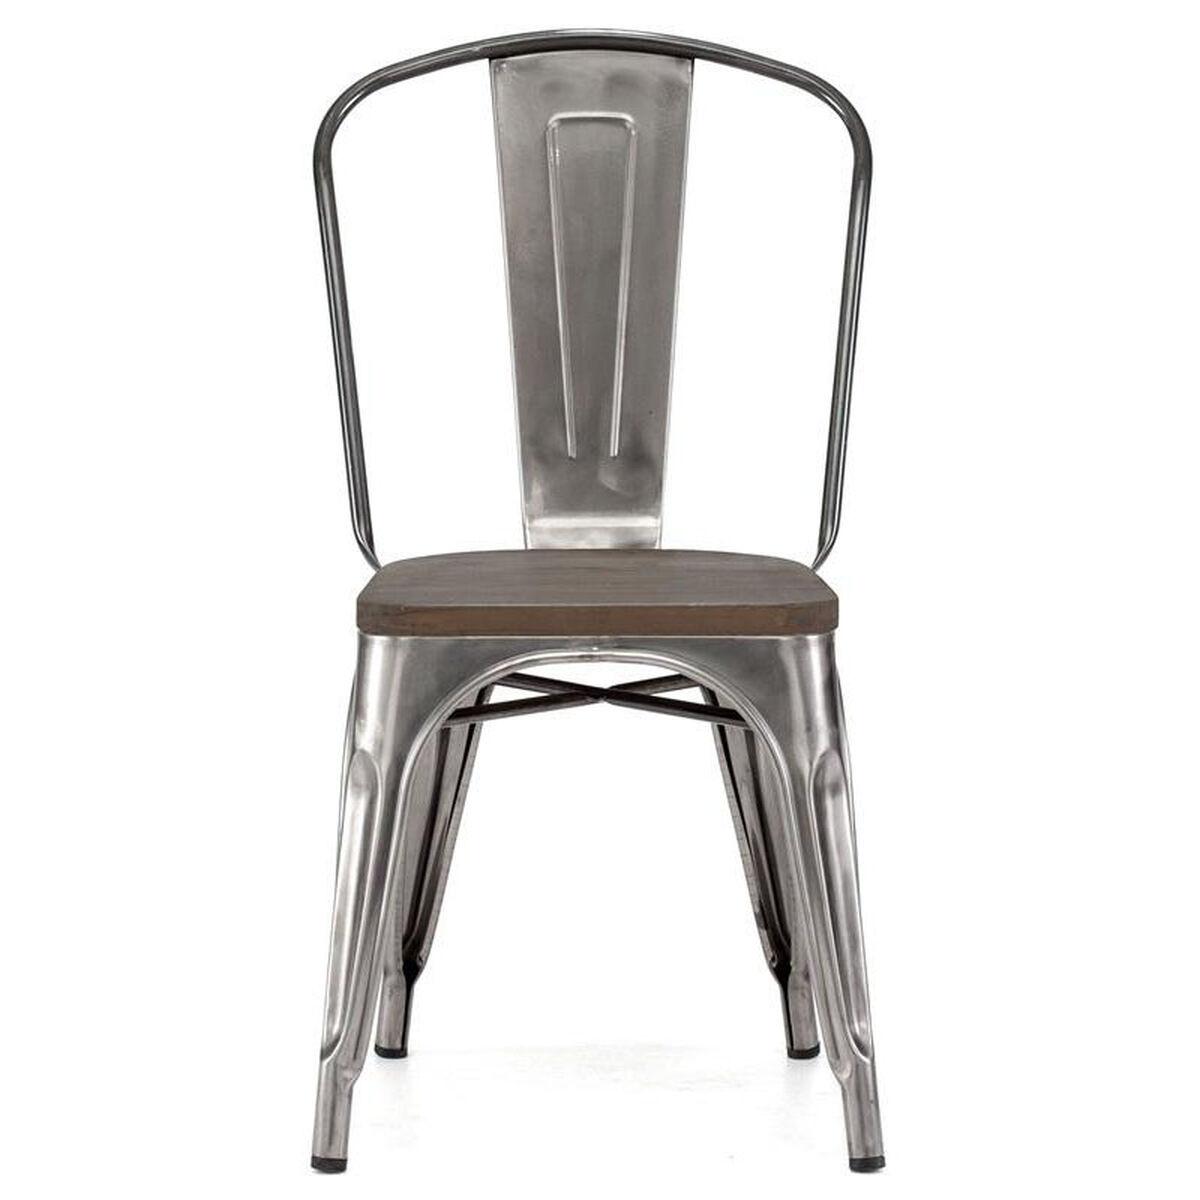 Set Of 4 Dreux Stack Side Chairs Ls 9000 Gunw Restaurantfurniture4less Com